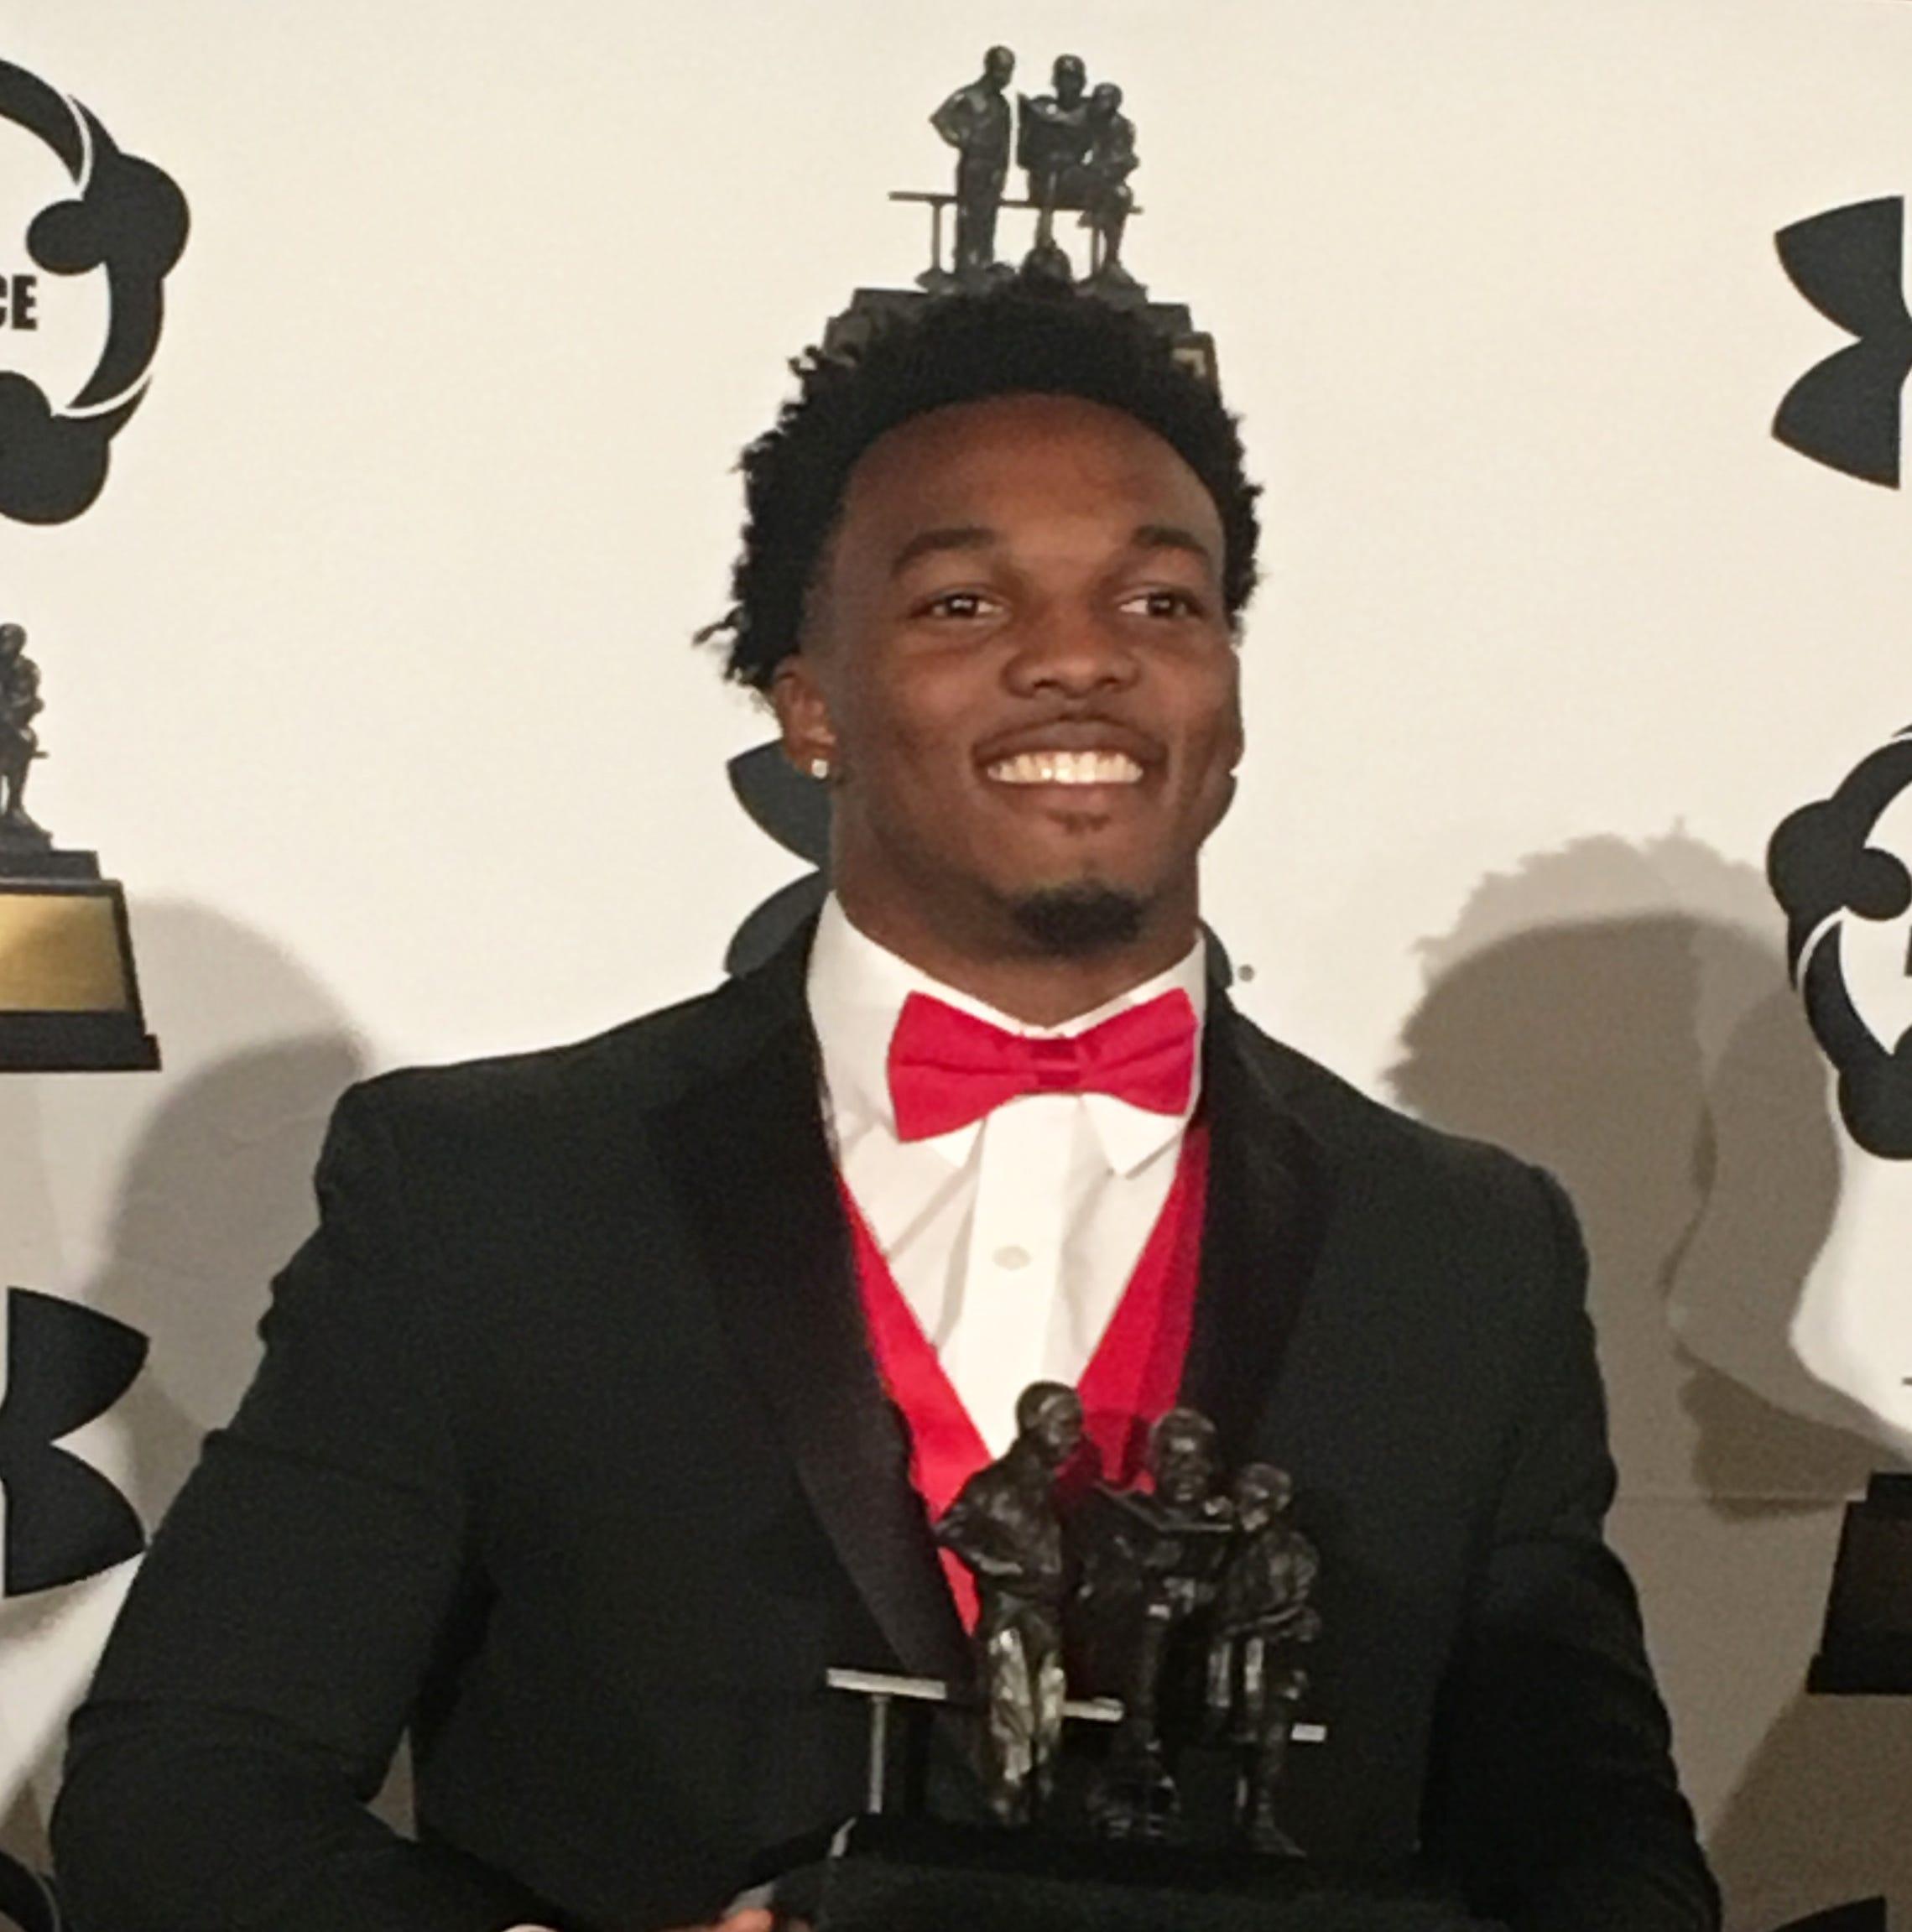 Horn Lake's Nakobe Dean wins Watkins Award for top African-American scholar athlete